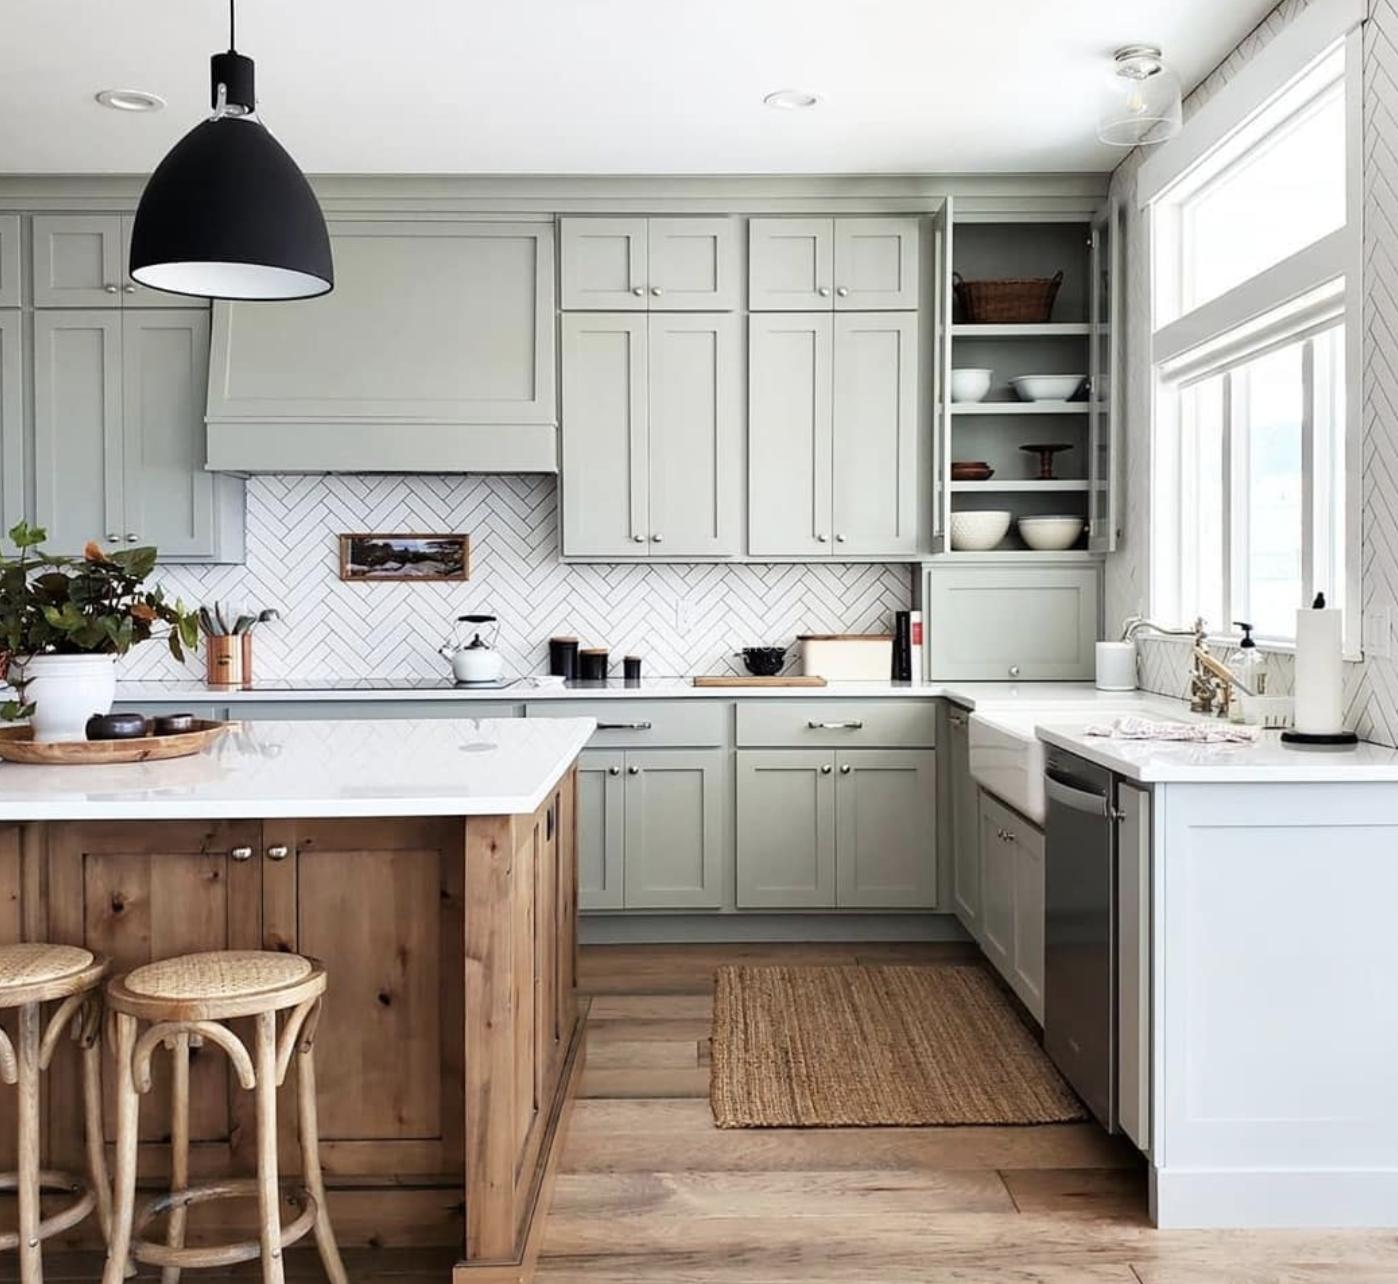 An elegant modular kitchen